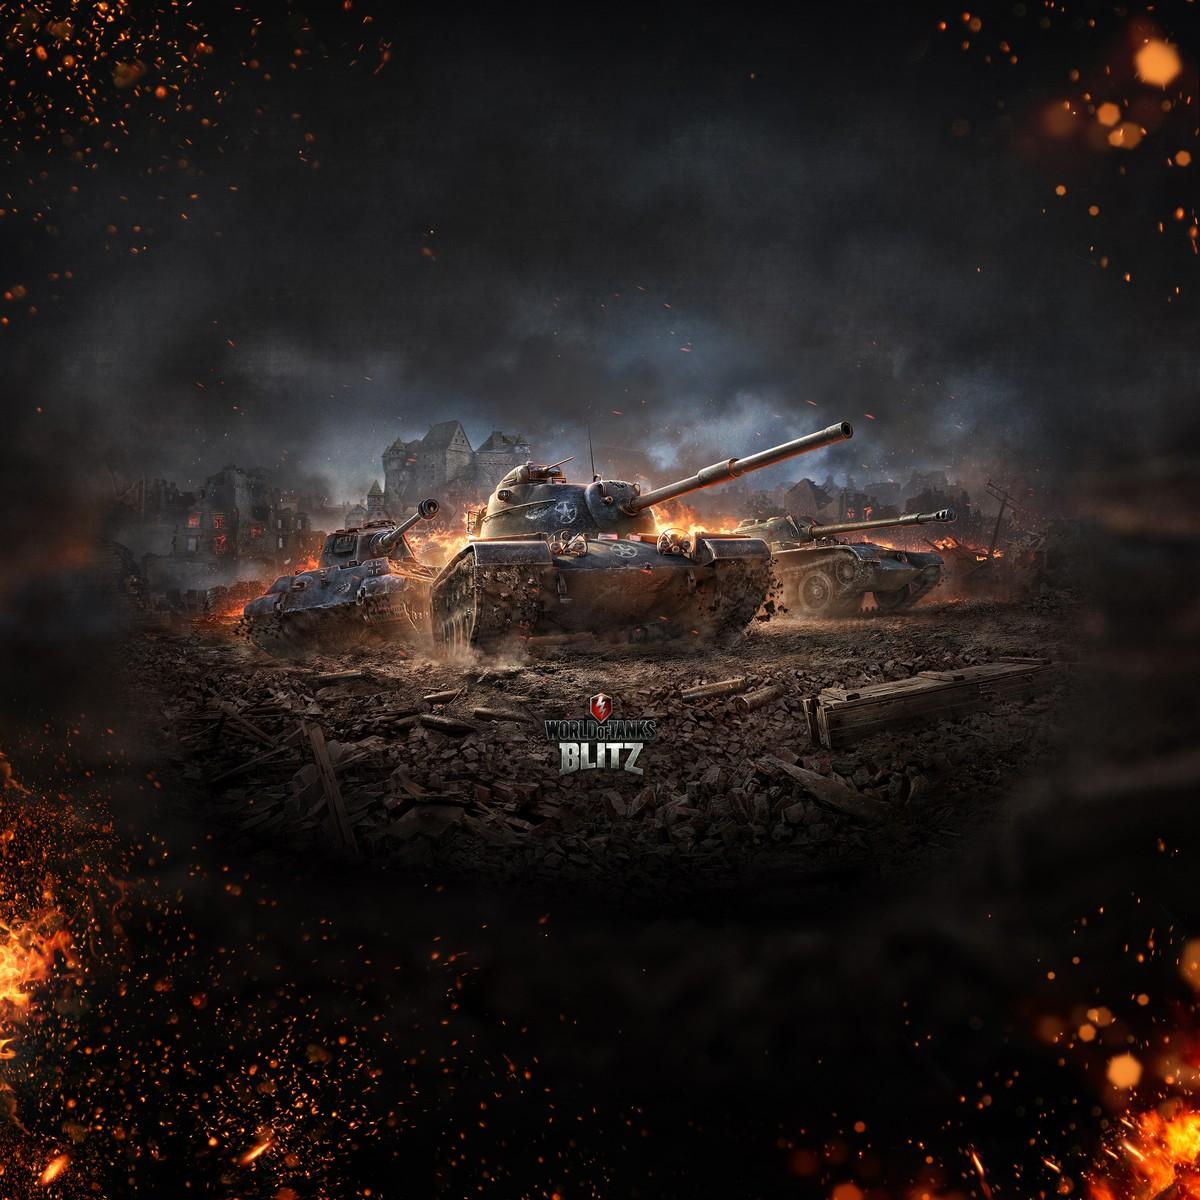 Обои для планшета – leopard 1 | world of tanks blitz 5. 0 фан сайт.